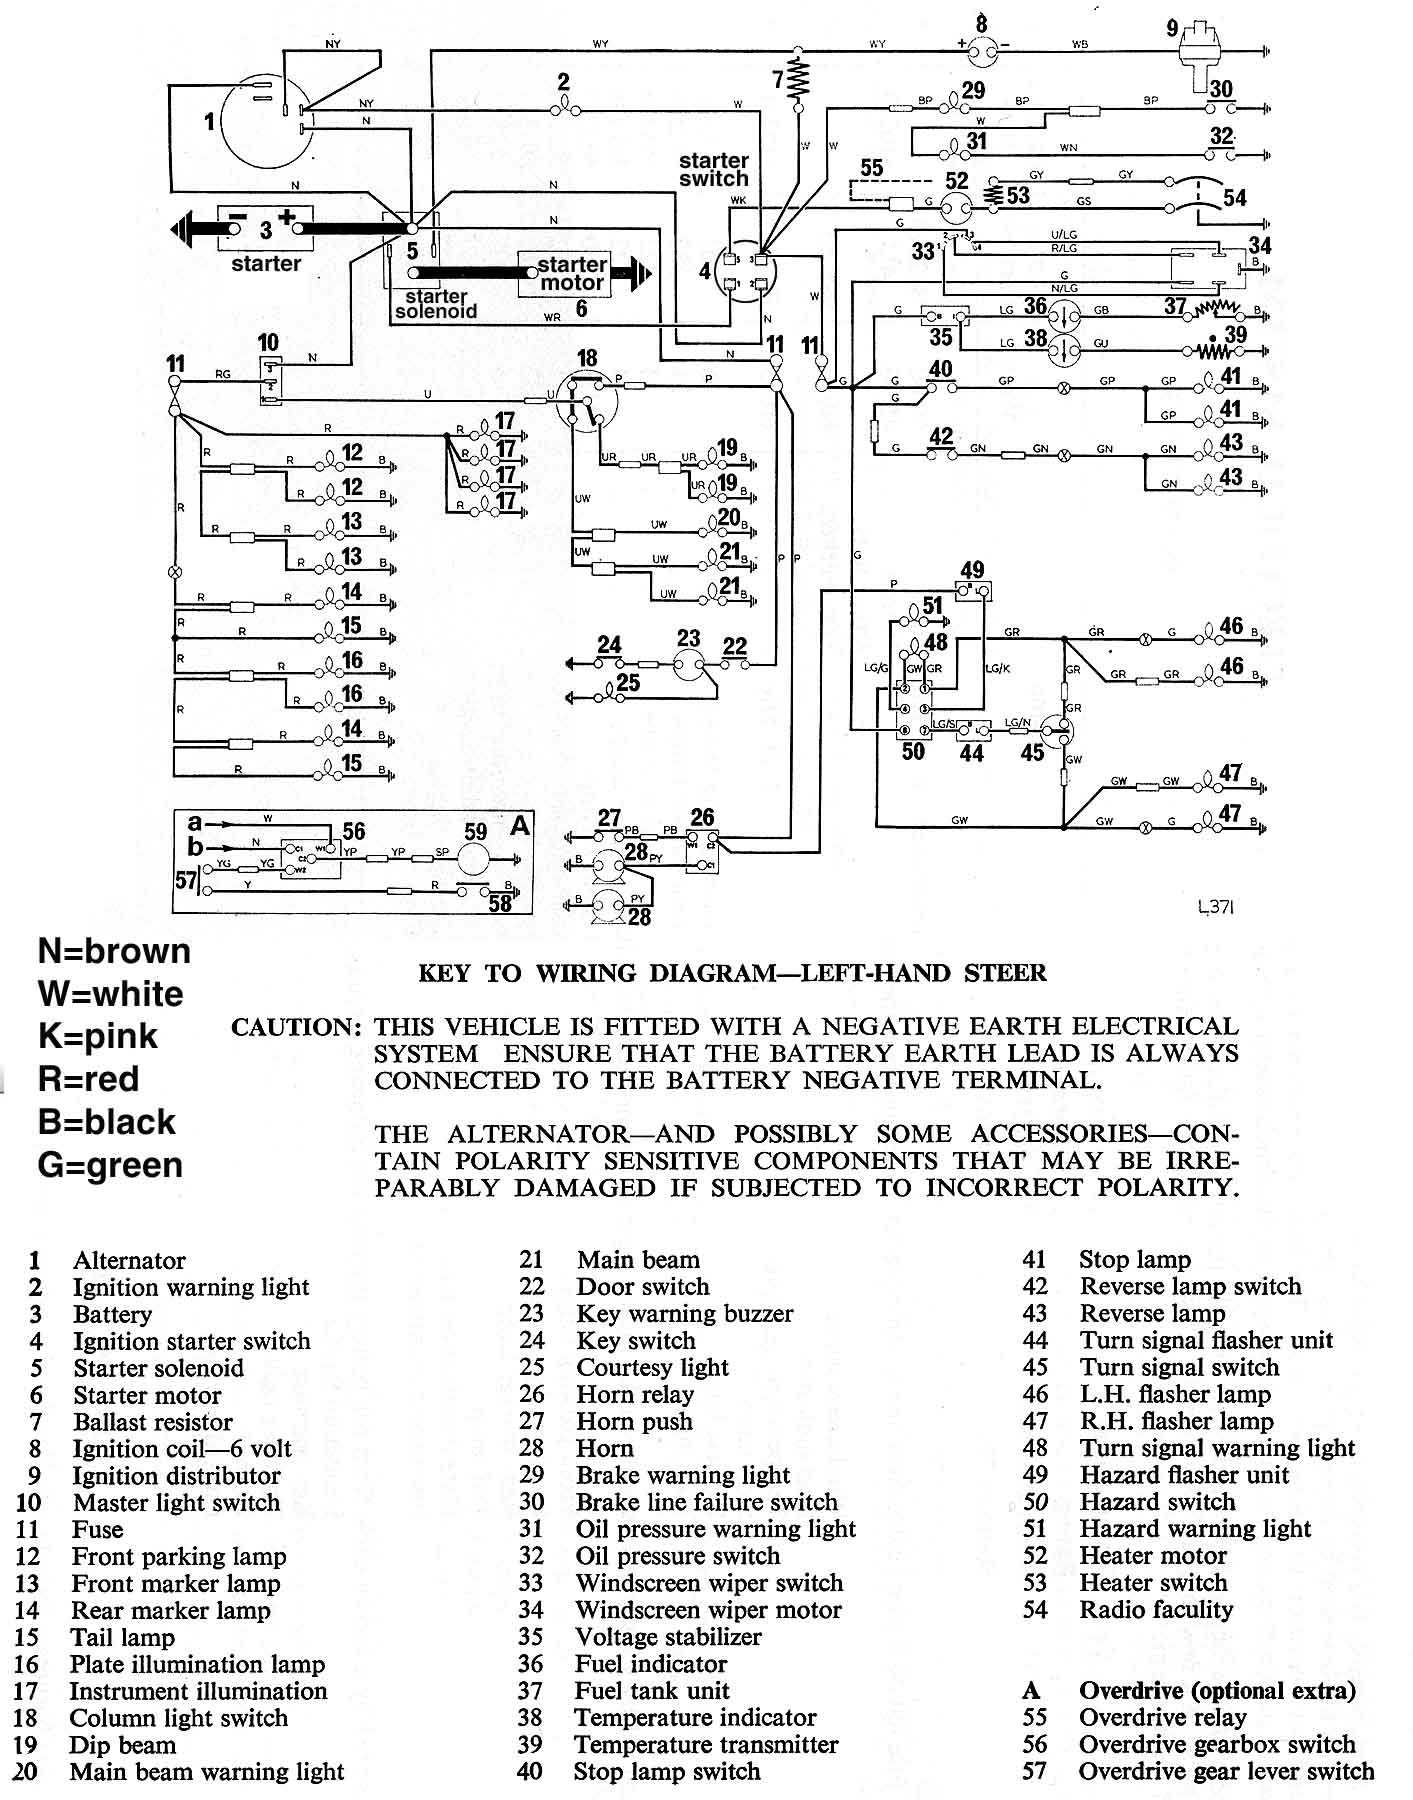 MKIVwire?resize=665%2C847 wiring diagram symbol key the wiring diagram readingrat net haynes wiring diagram legend at soozxer.org